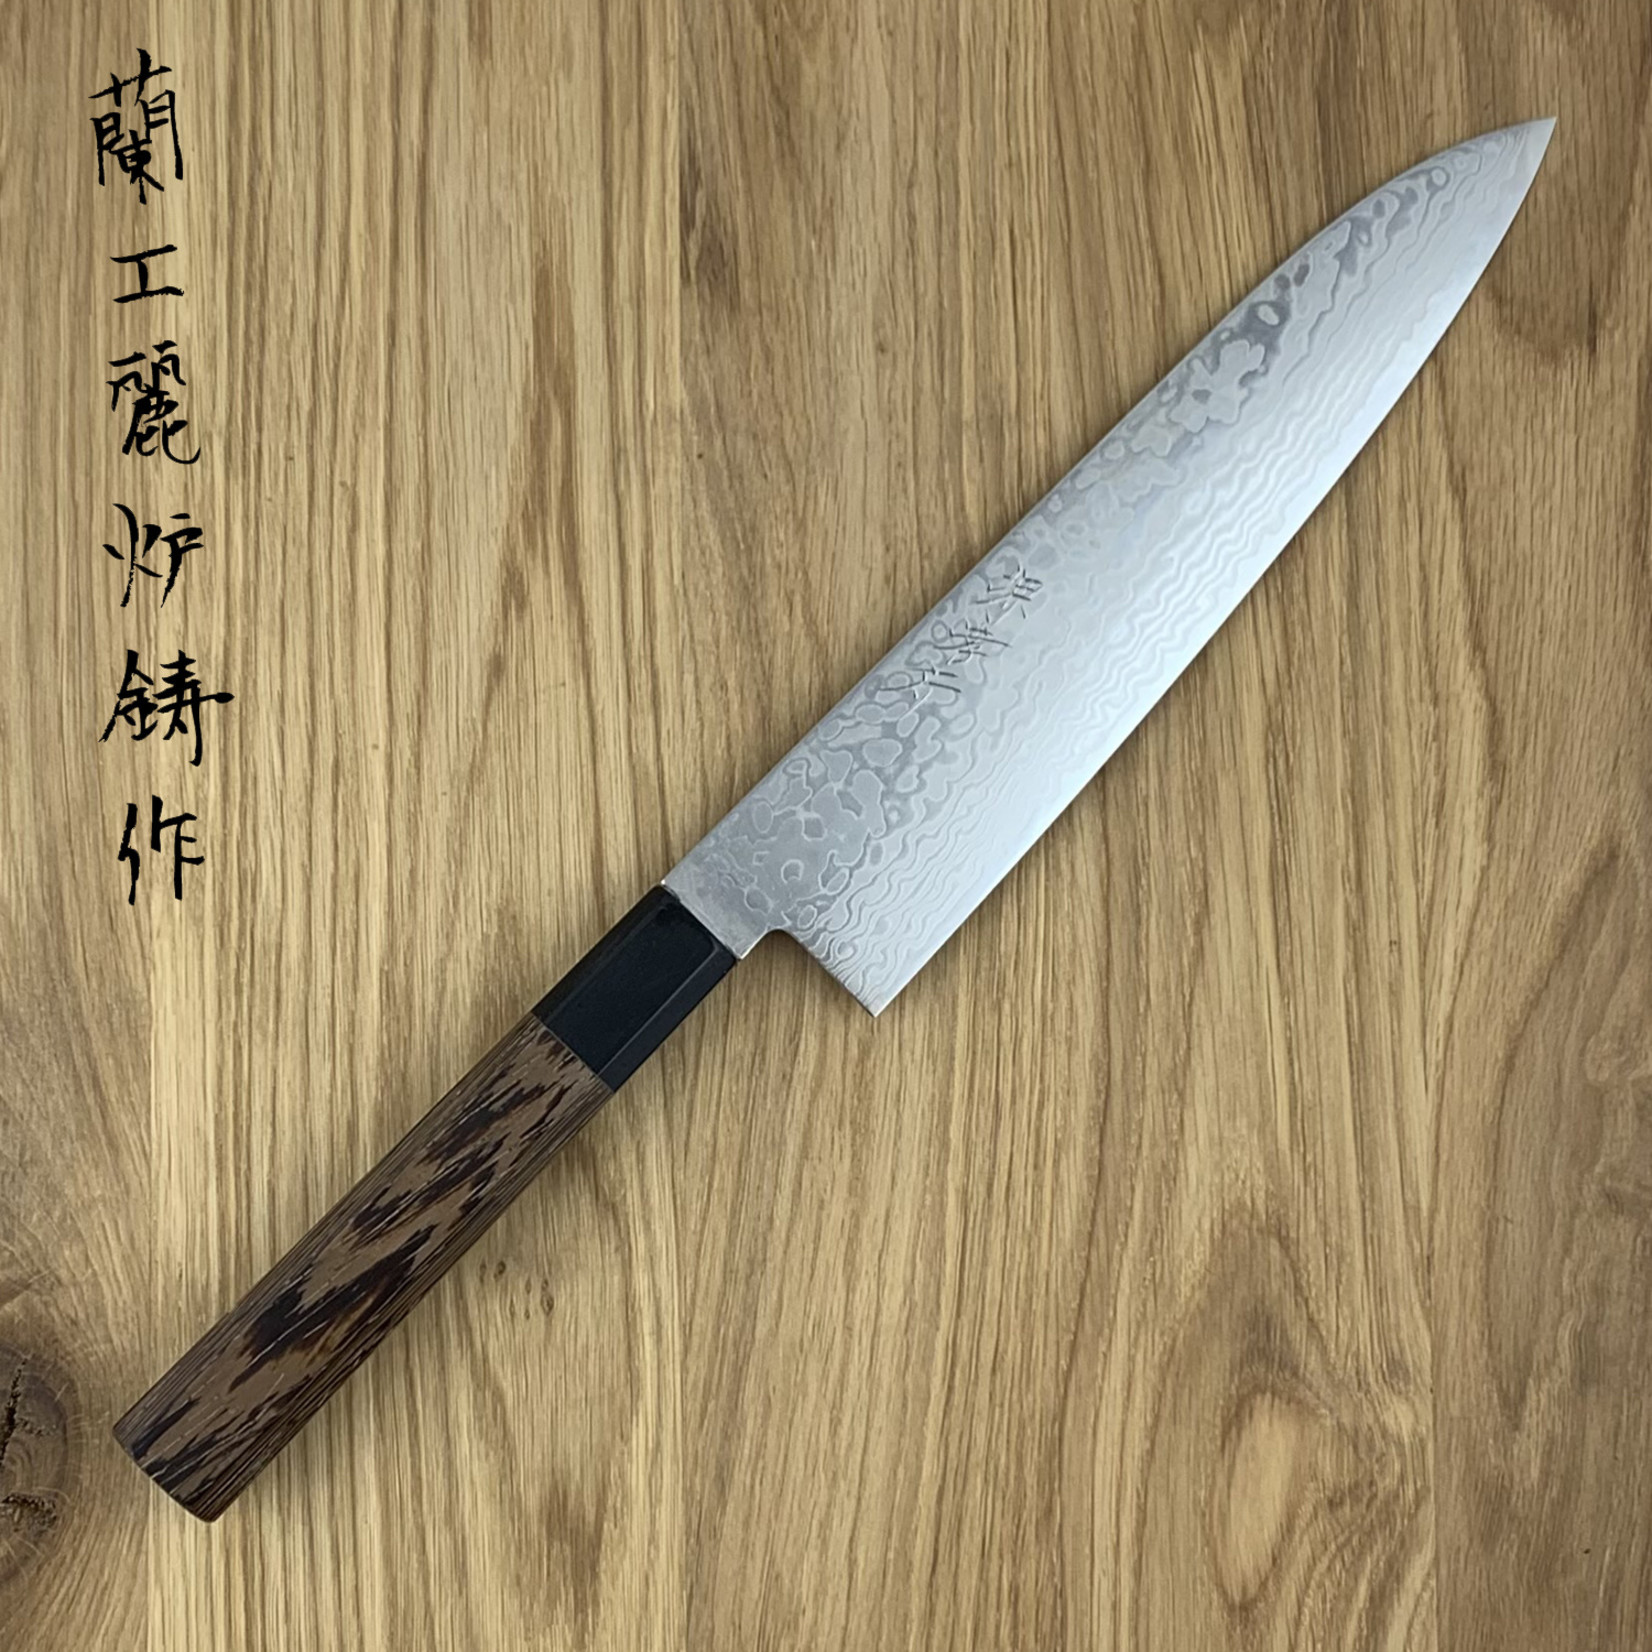 SAKAI TAKAYUKI GINGA Gyuto 240 mm 07885